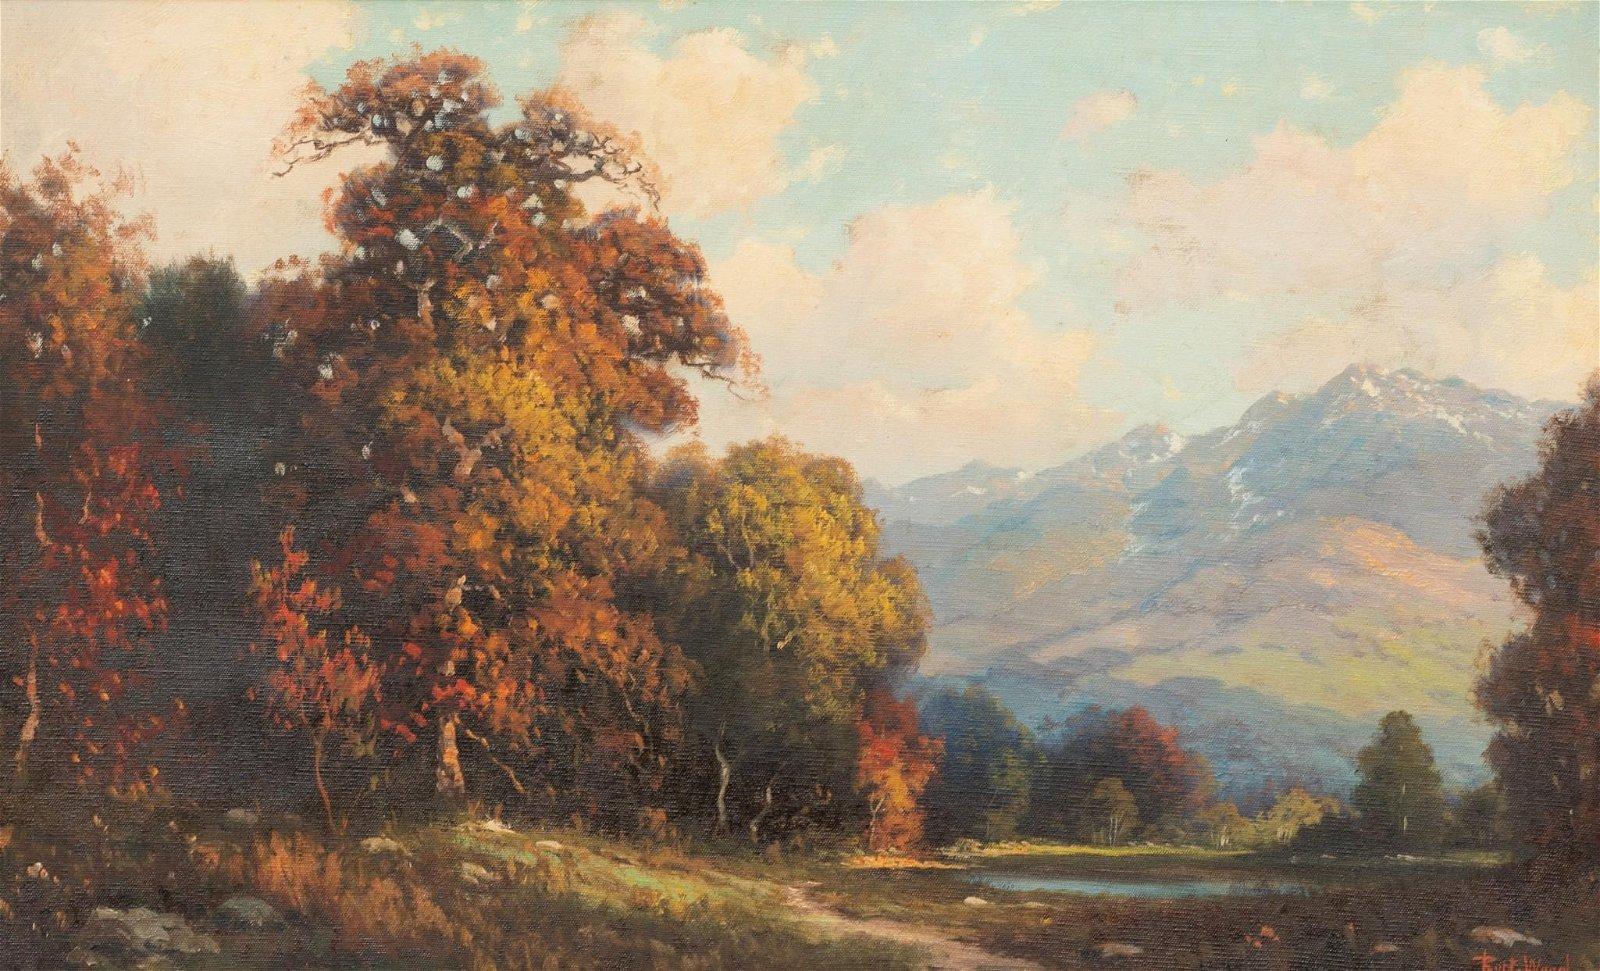 Robert Wood (1889-1979), Autumn Landscape, oil